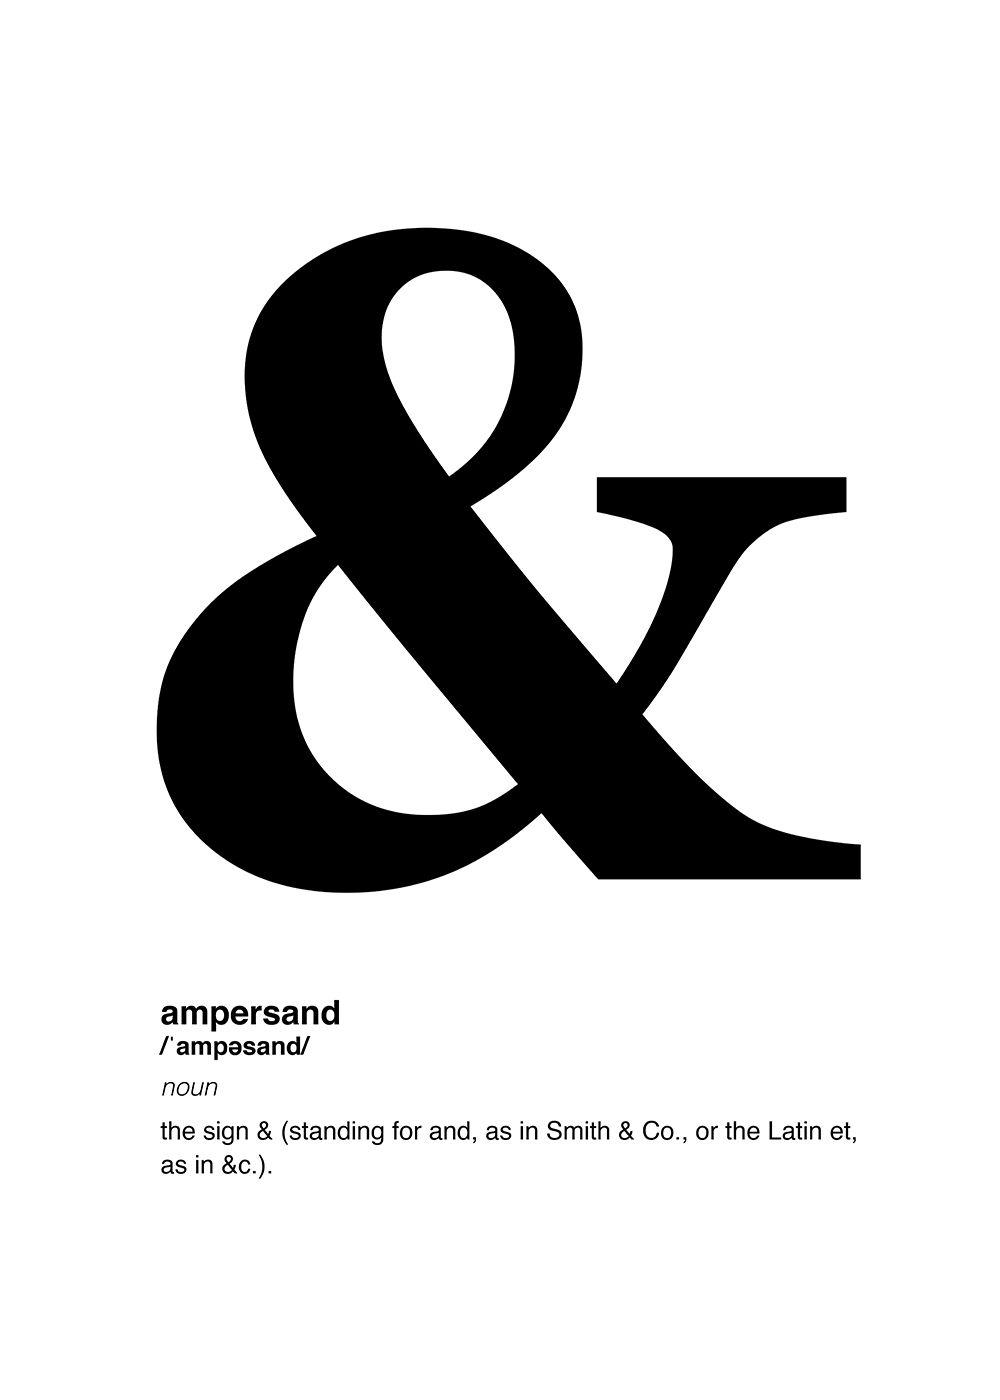 Poster design definition - Poster Definition Of Ampersand